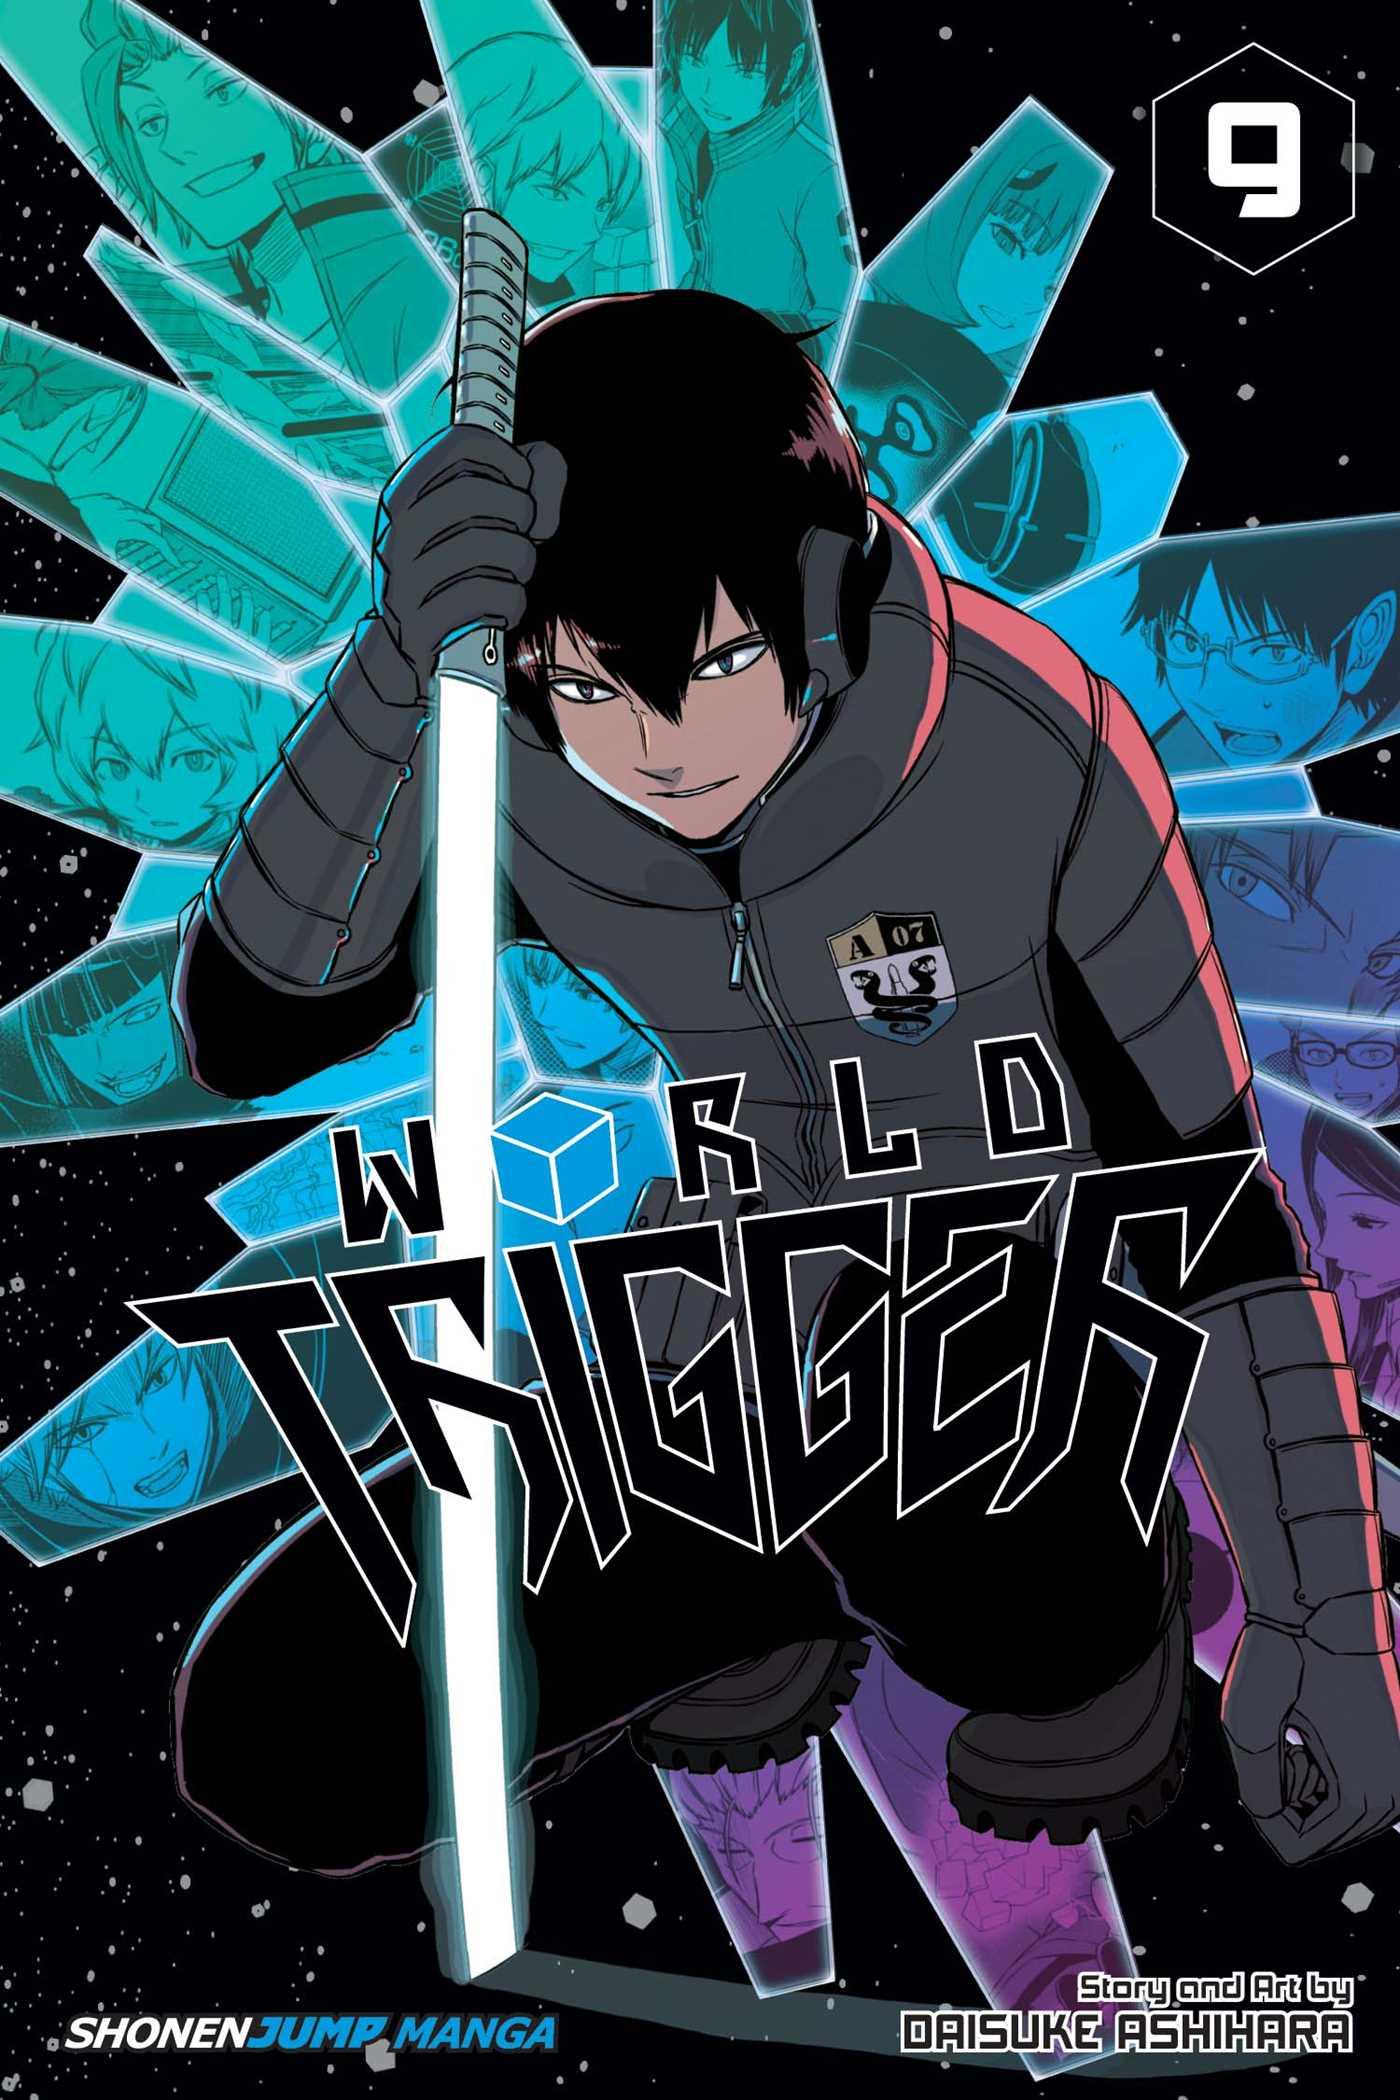 World trigger season 2 episode 7 Release date spoiler watch online